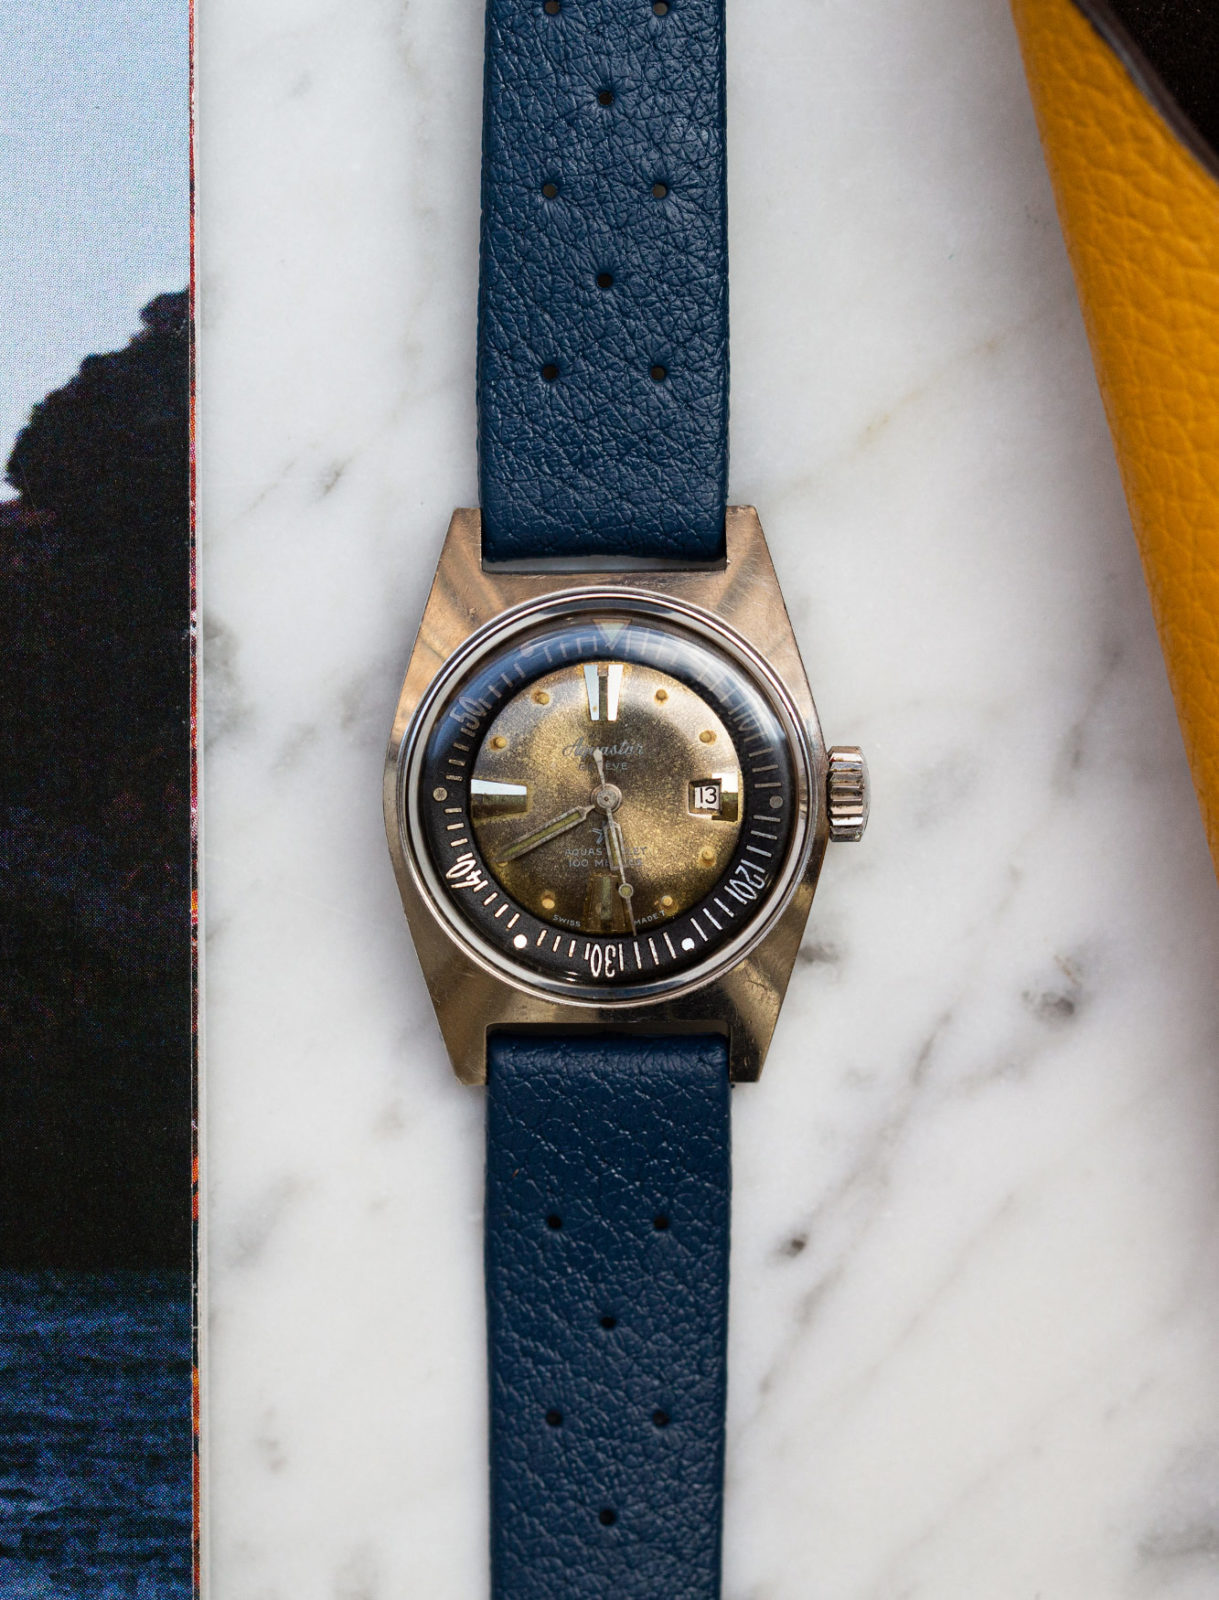 Aquastar Aquastarlet - Sélection de montres vintage chez Joseph Bonnie